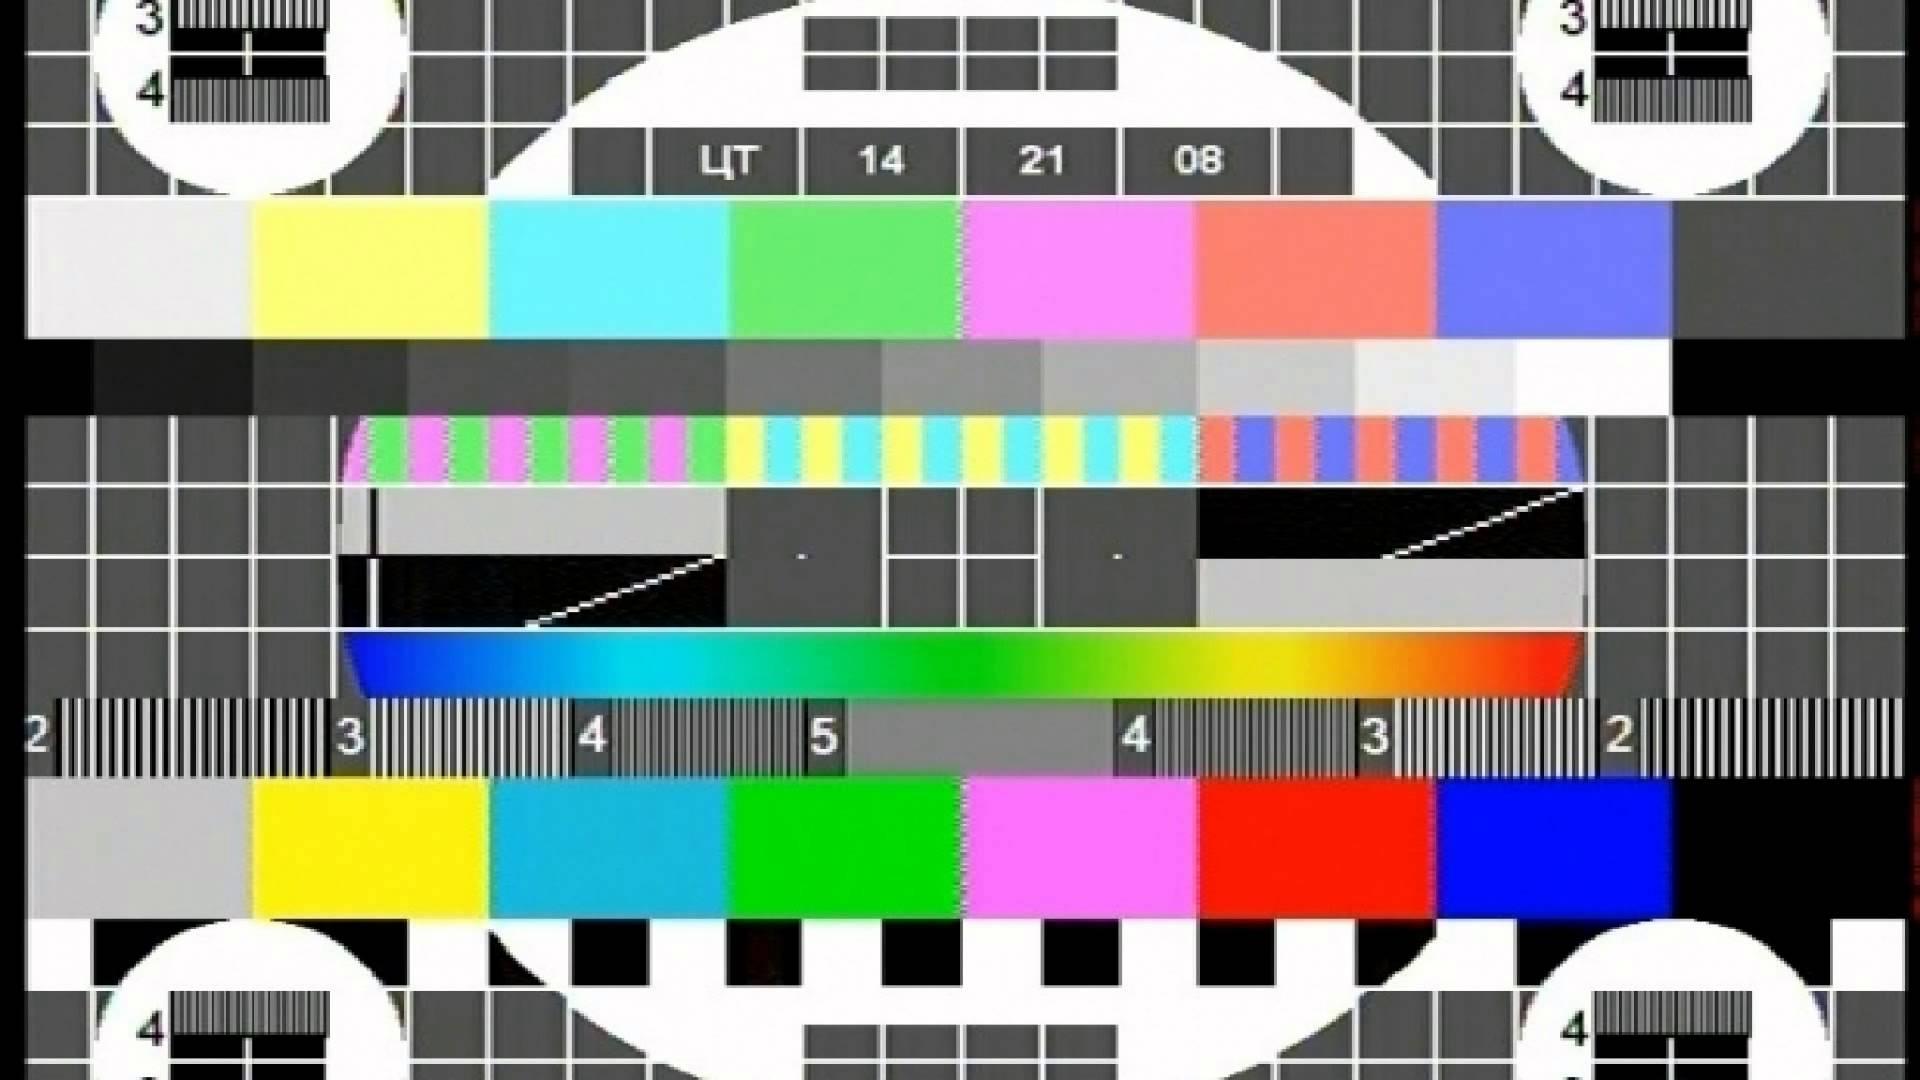 картинка нет сети на телевизоре сейлор мун